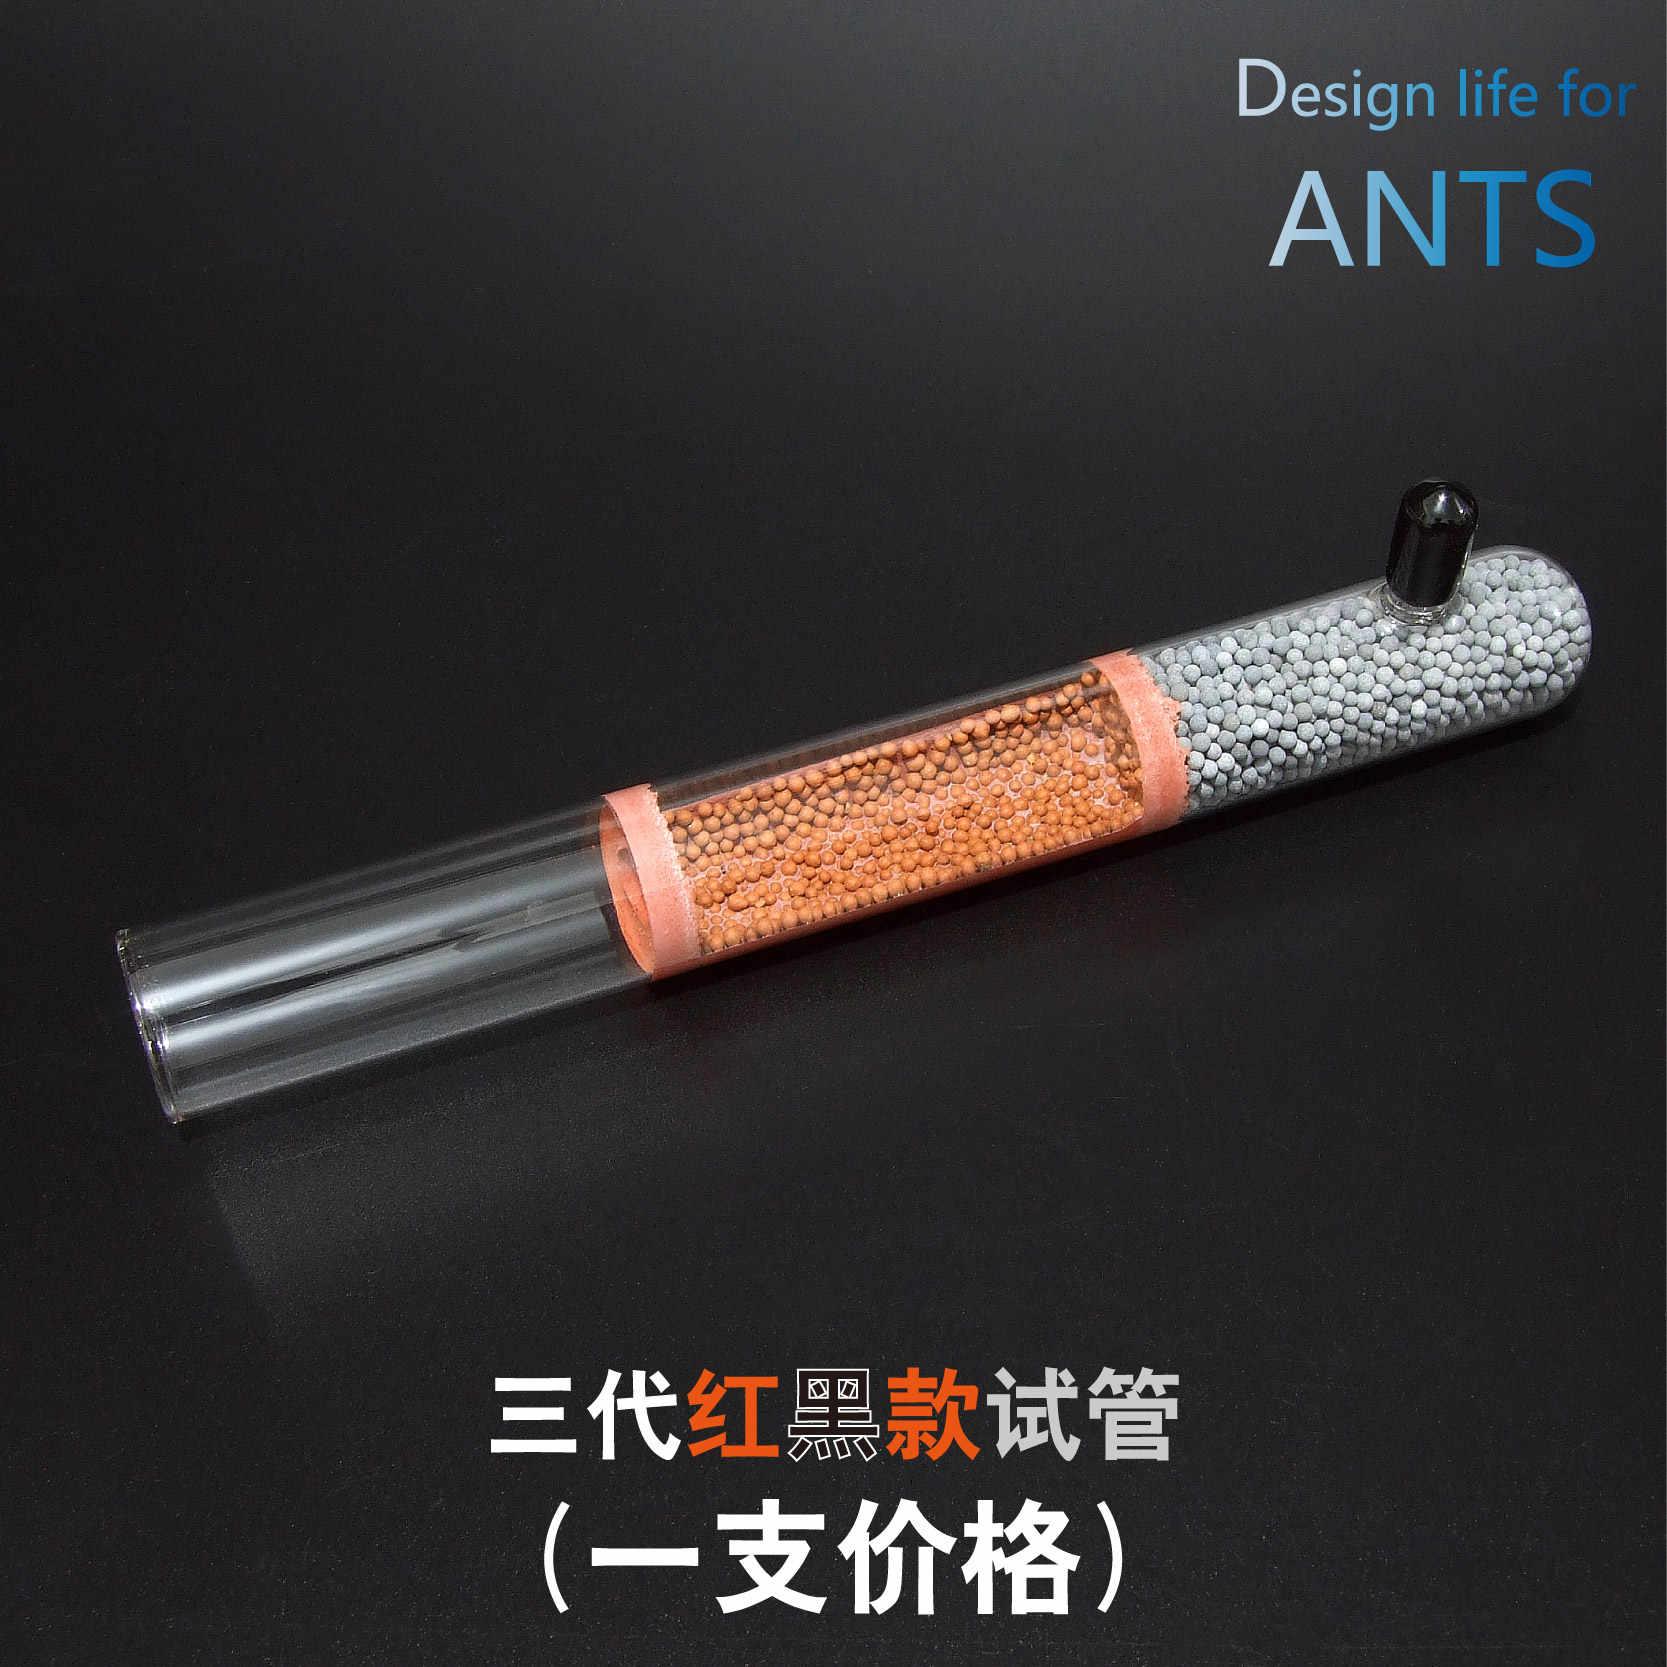 Beton Bionic Sarang Semut/Baru Yang Canggih Post-Budaya Sarang/25*200 Mm Diameter Bambu Sarang/ semut Rumah